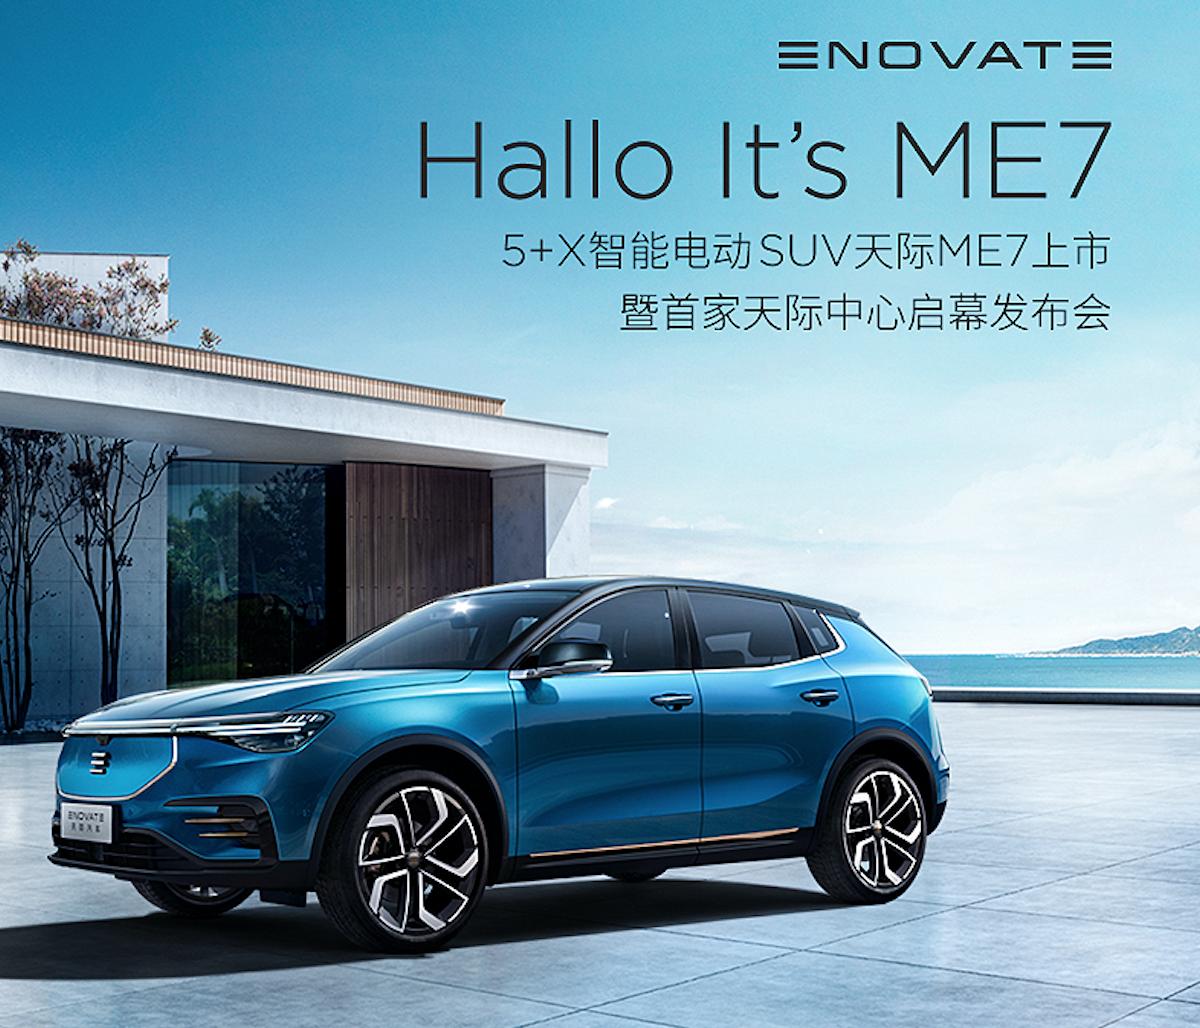 5+X智能电动SUV天际ME7上市暨首家天际中心启幕发布会